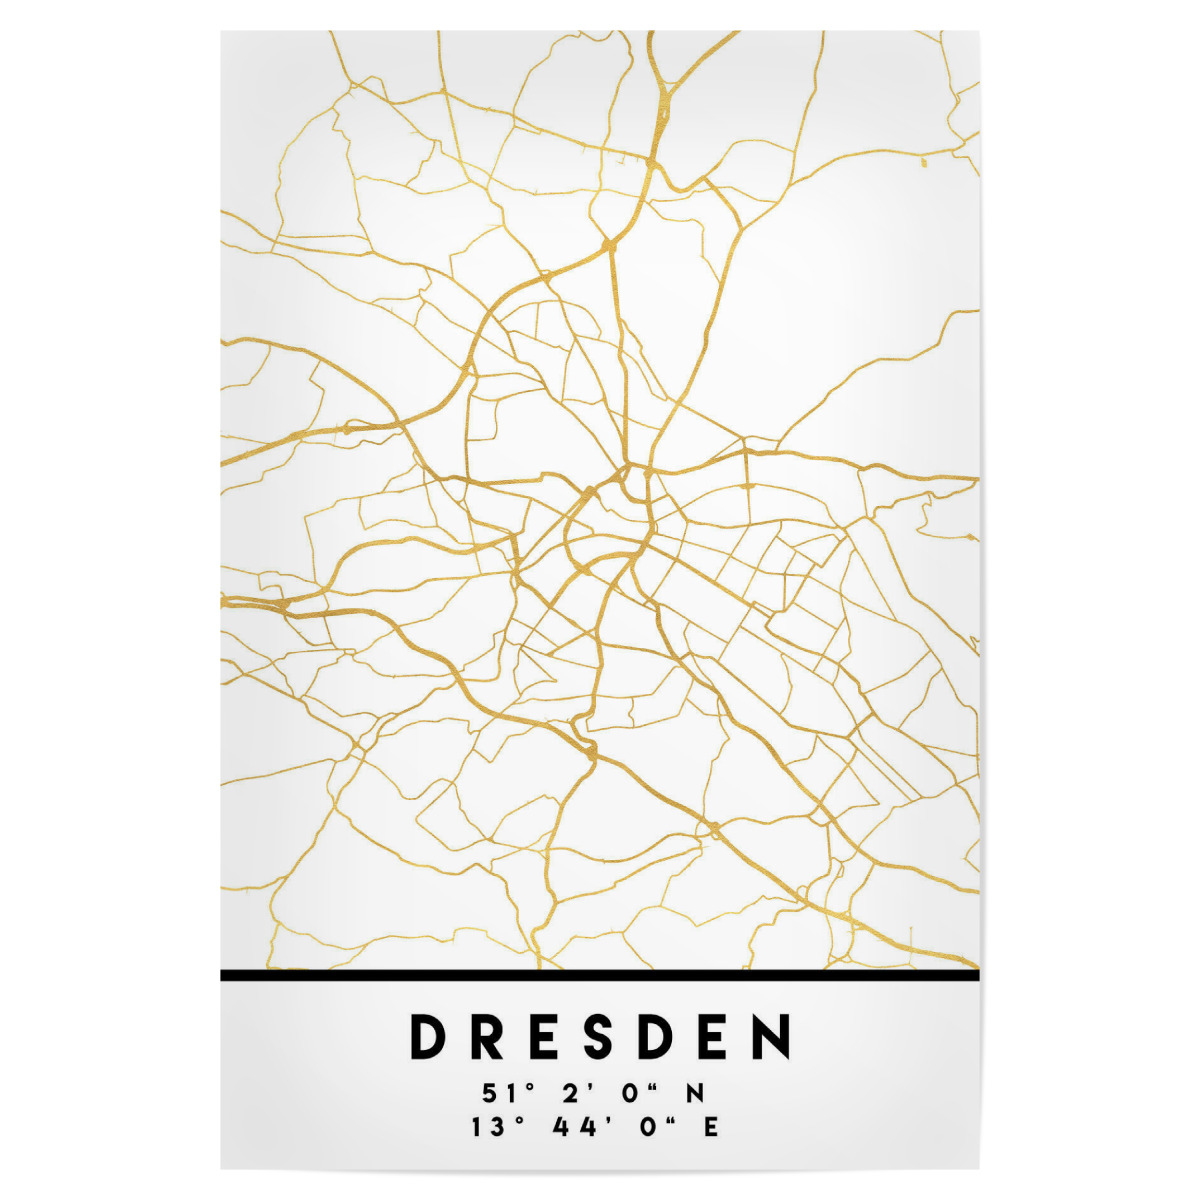 DRESDEN GERMANY STREET MAP ART als Poster bei artboxONE kaufen on